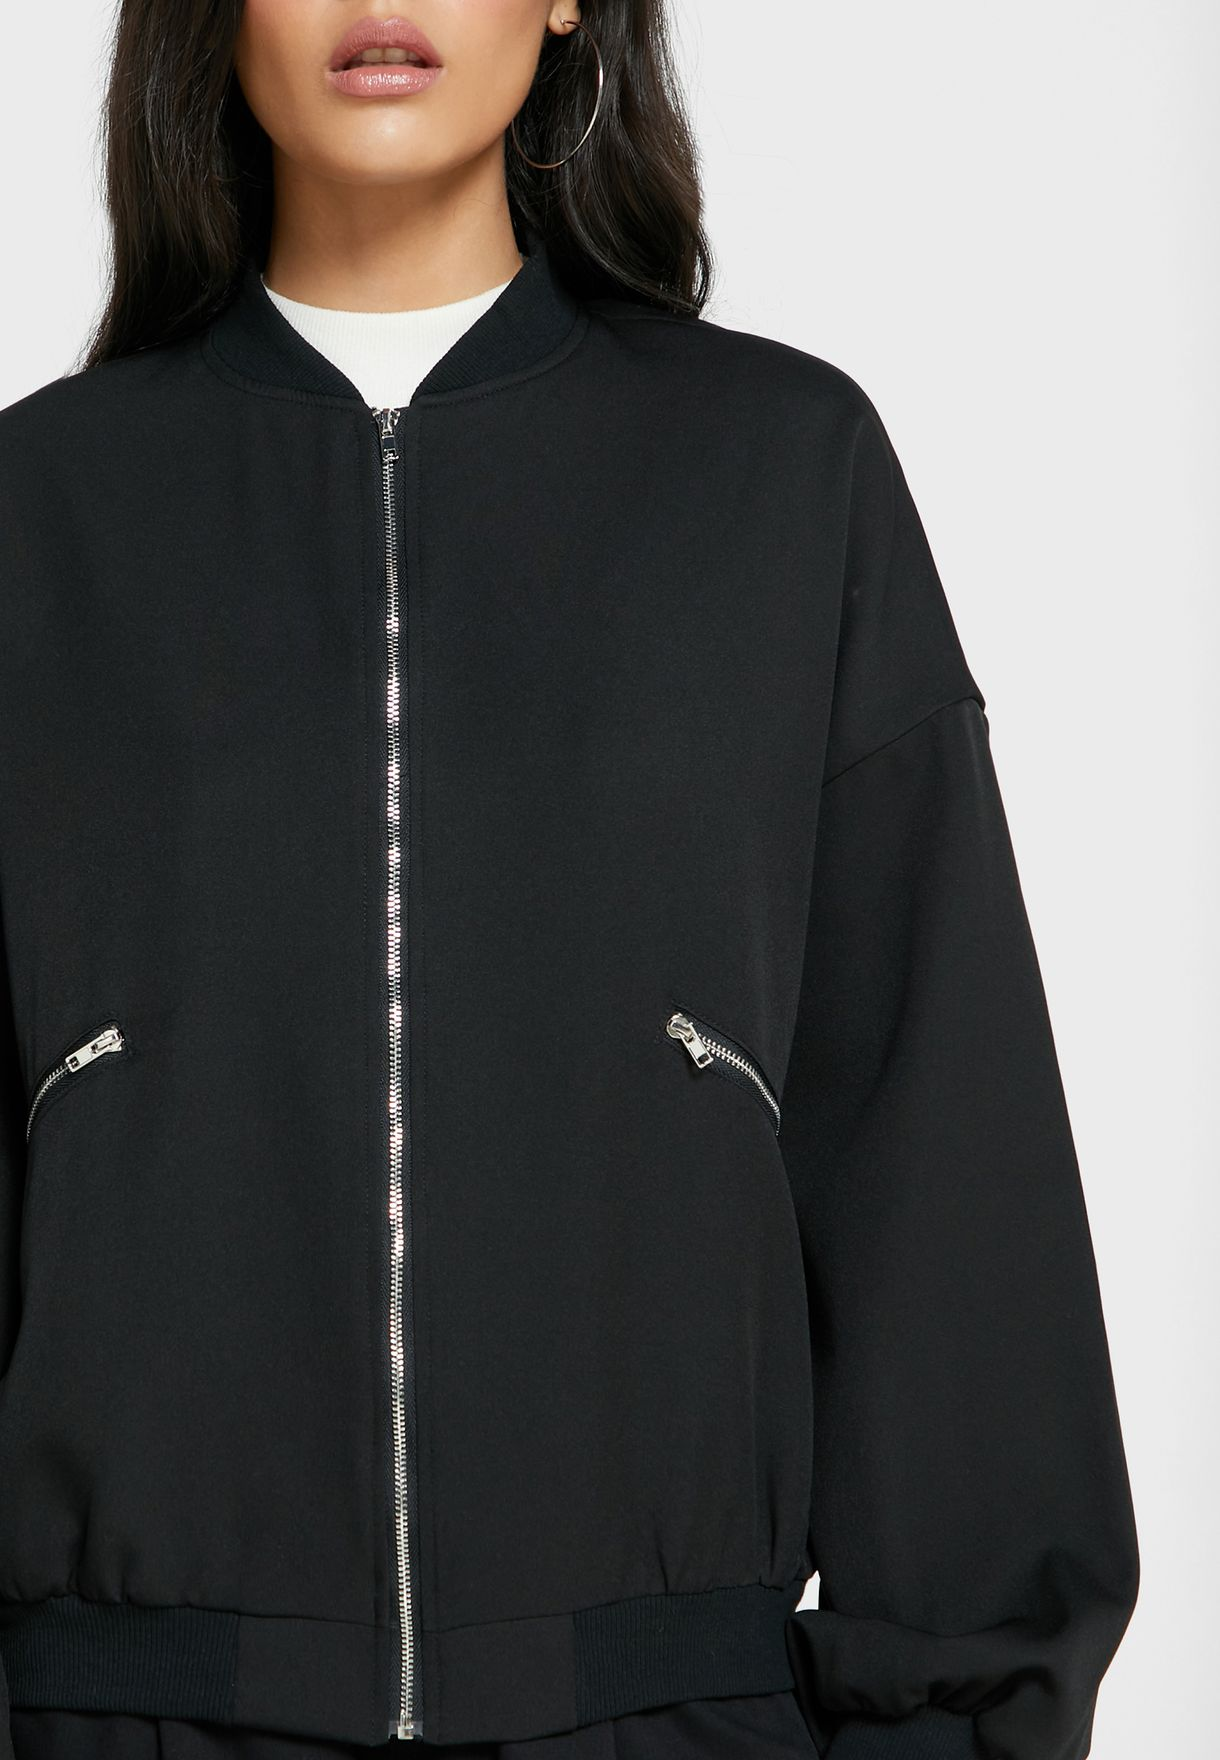 Zip Detail Pocket Bomber Jacket